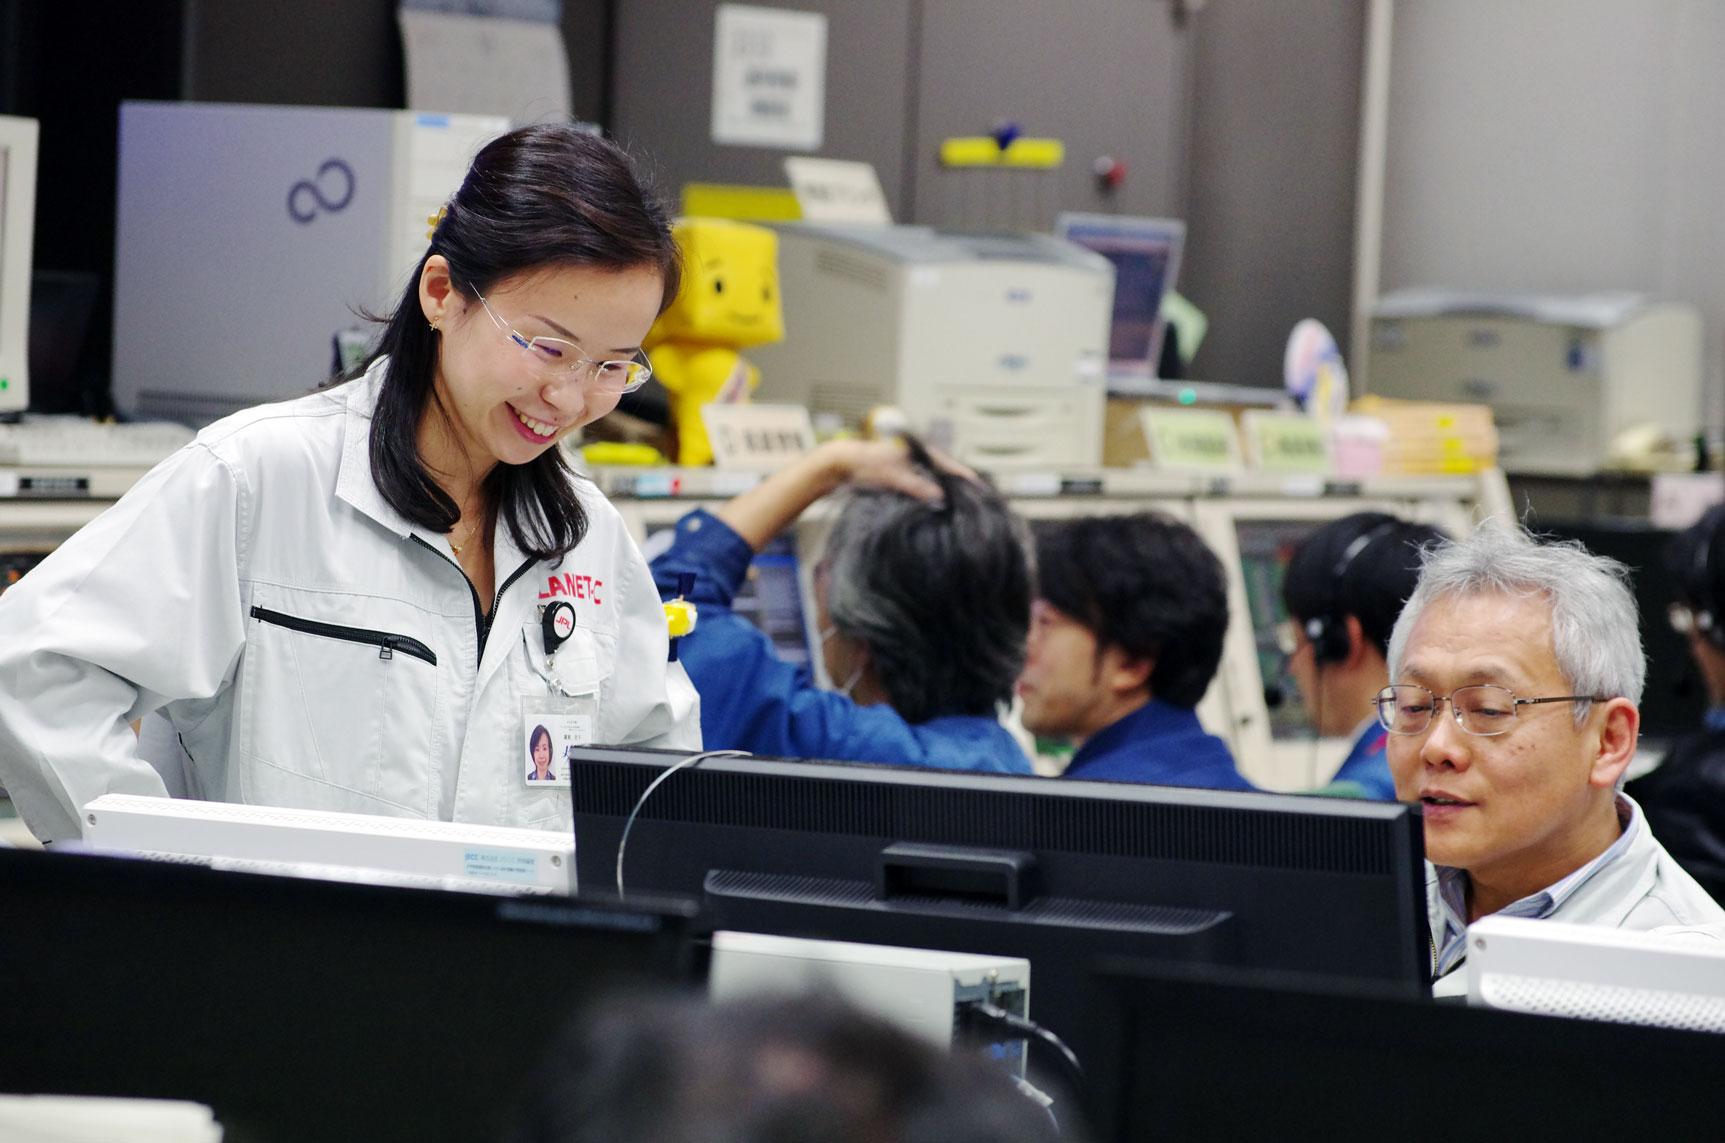 Akatsuki's ground team monitors the spacecraft's arrival at Venus from a control center in Sagamihara, Japan. Credit: JAXA